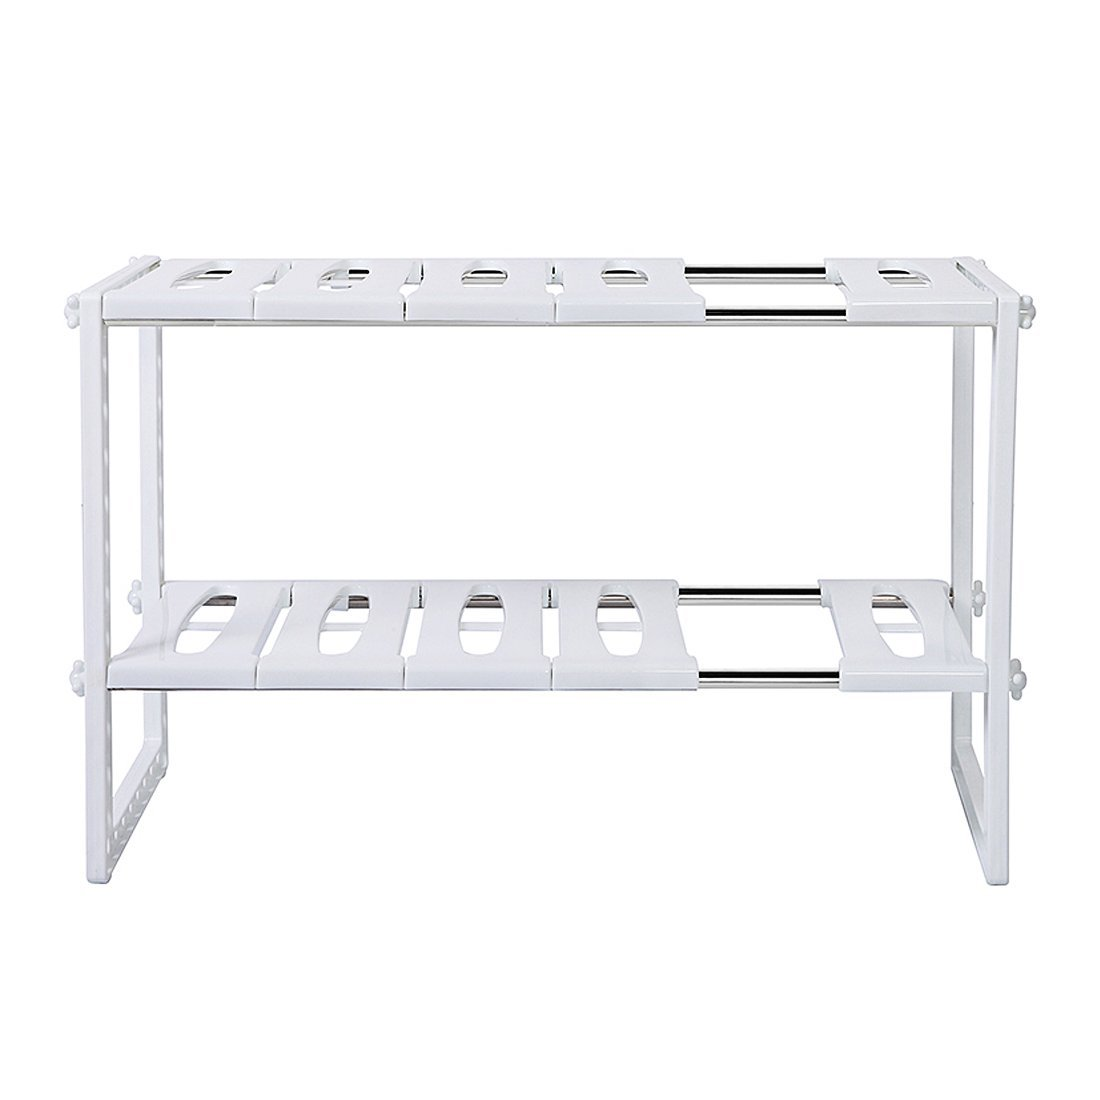 Under Shelf Basket Storage Space Saving Steel Bronze: 2-Tier Space Saving Expendable Under Sink Shelf Adjustable